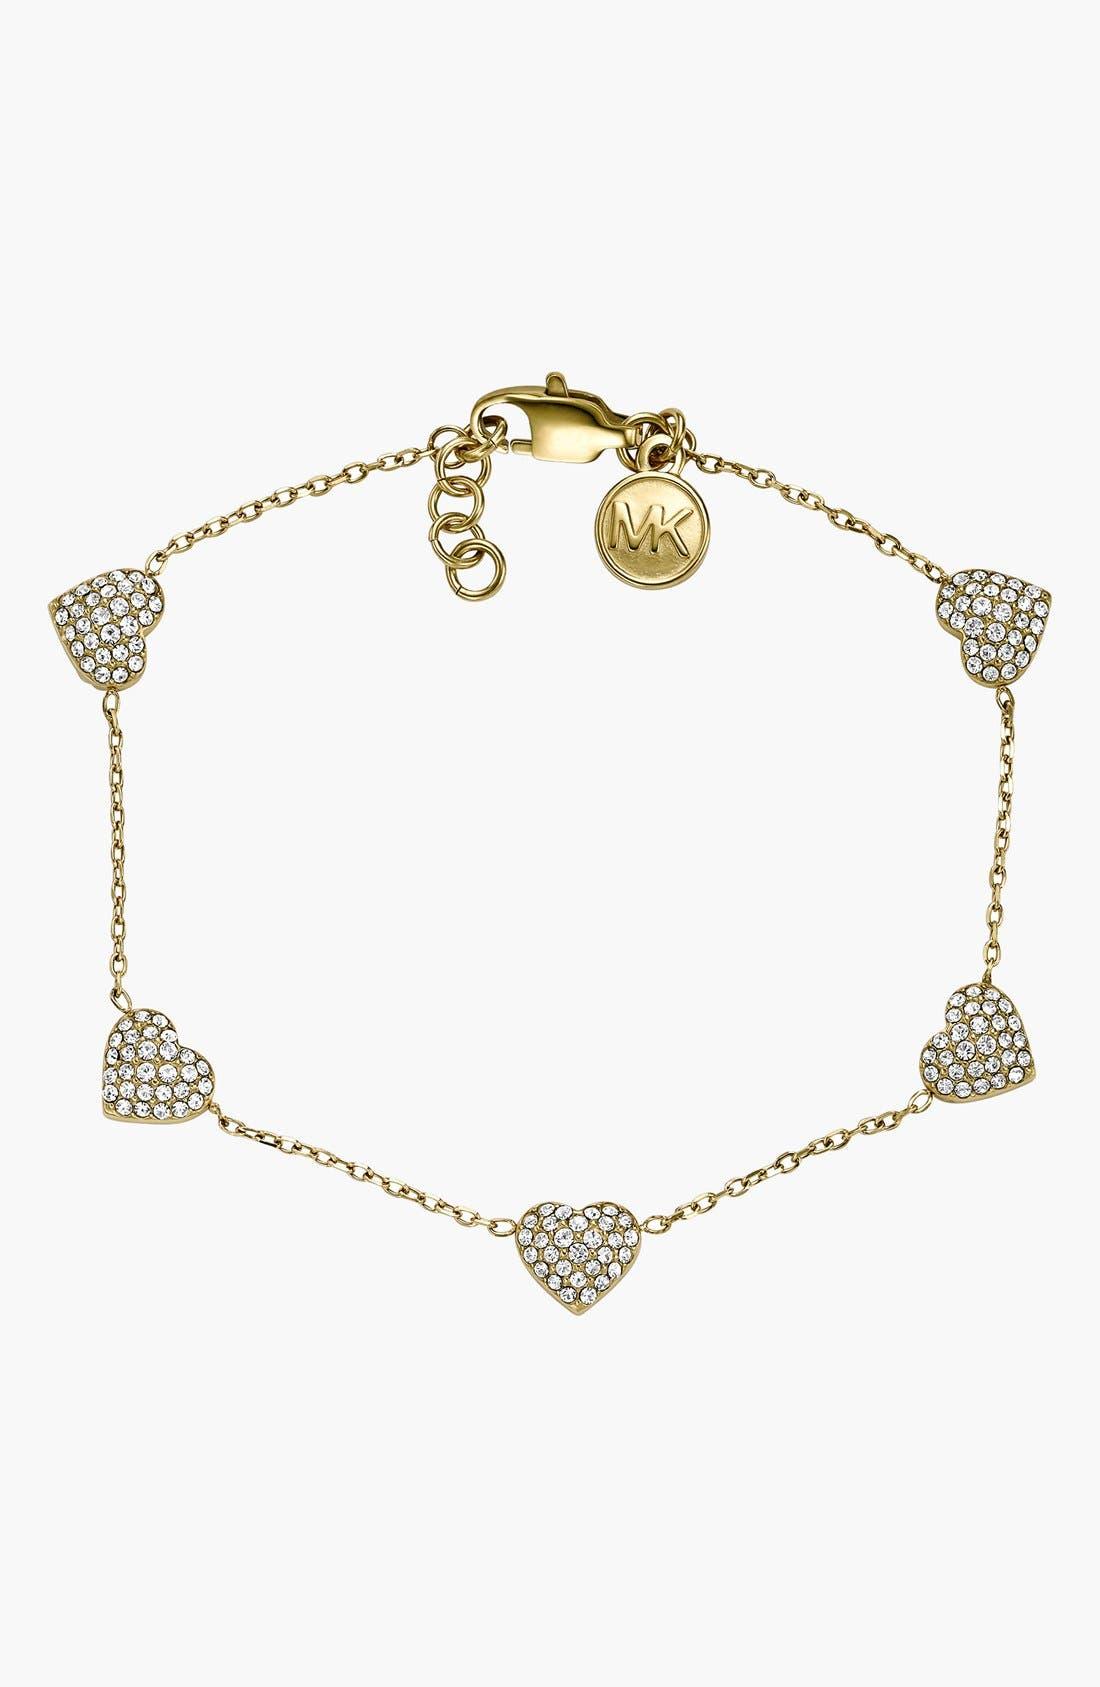 Alternate Image 1 Selected - Michael Kors 'Motif Brilliance' Pavé Heart Station Bracelet